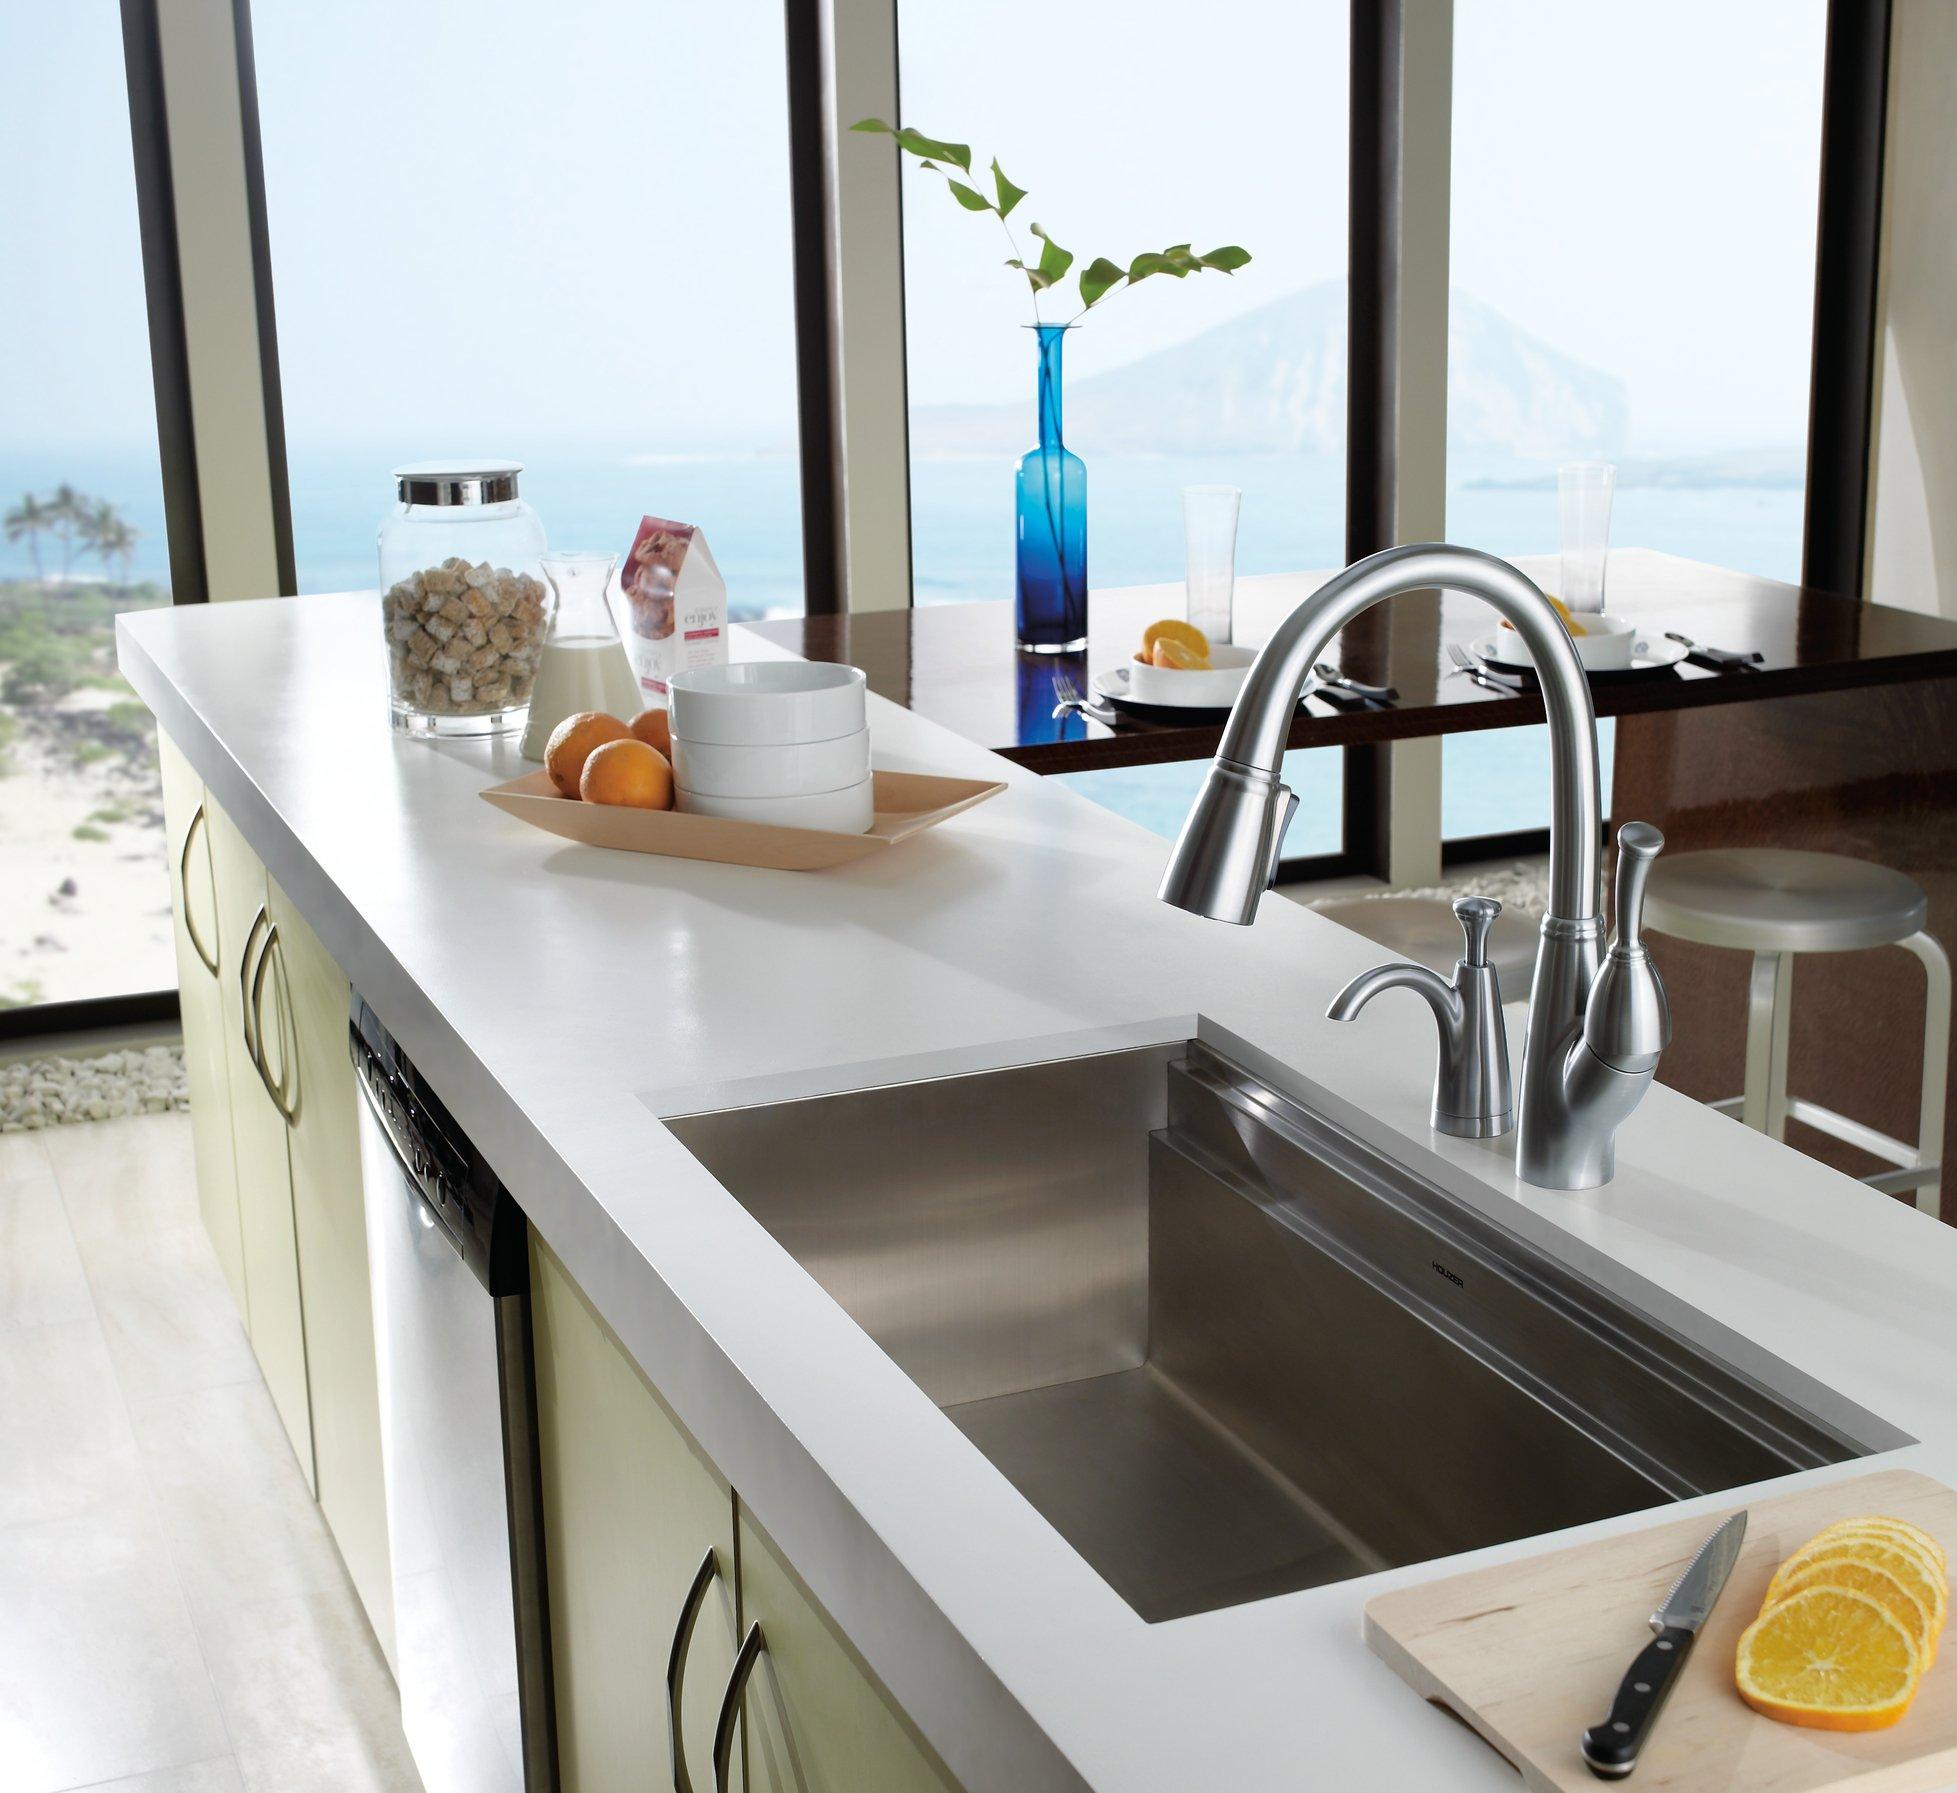 Delta Faucet RP47280AR Allora, Soap/Lotion Dispenser, Arctic Stainless